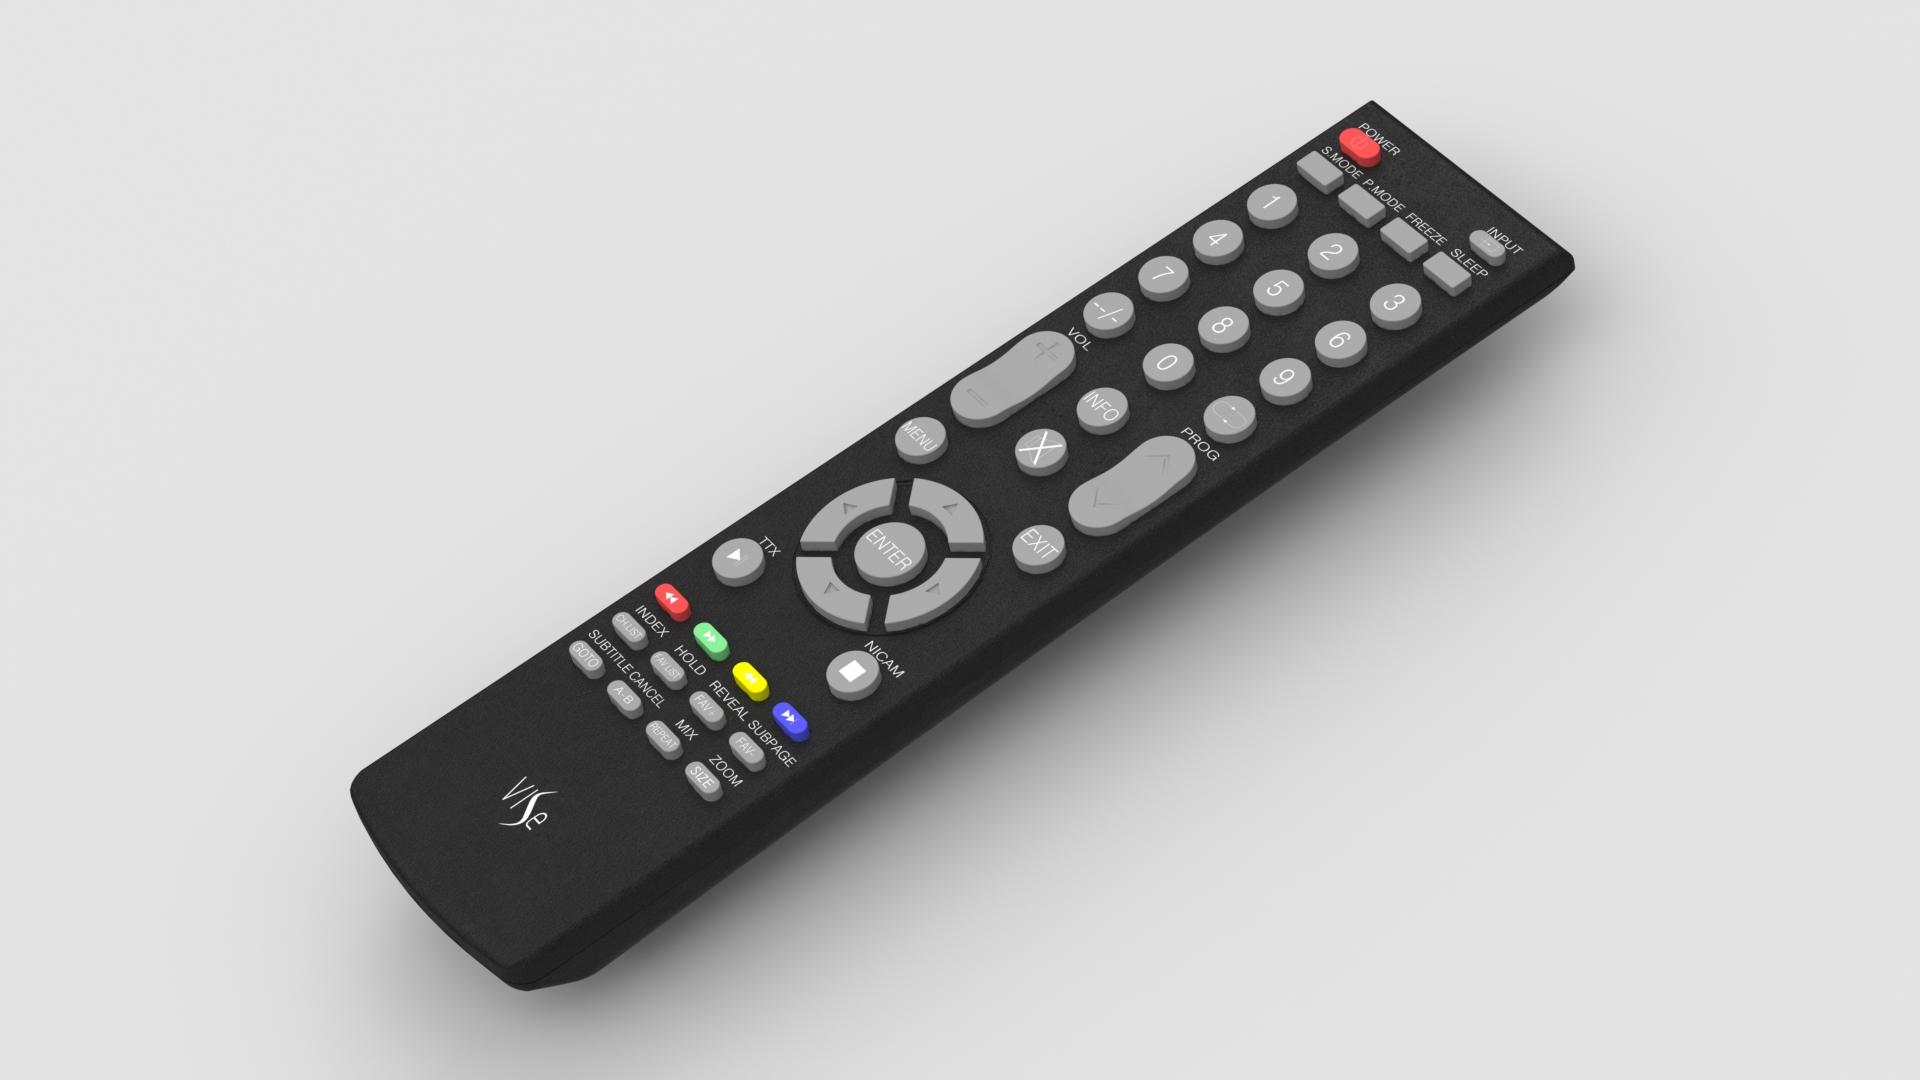 Vise电视遥控器简易模型3D图纸 Solidworks设计